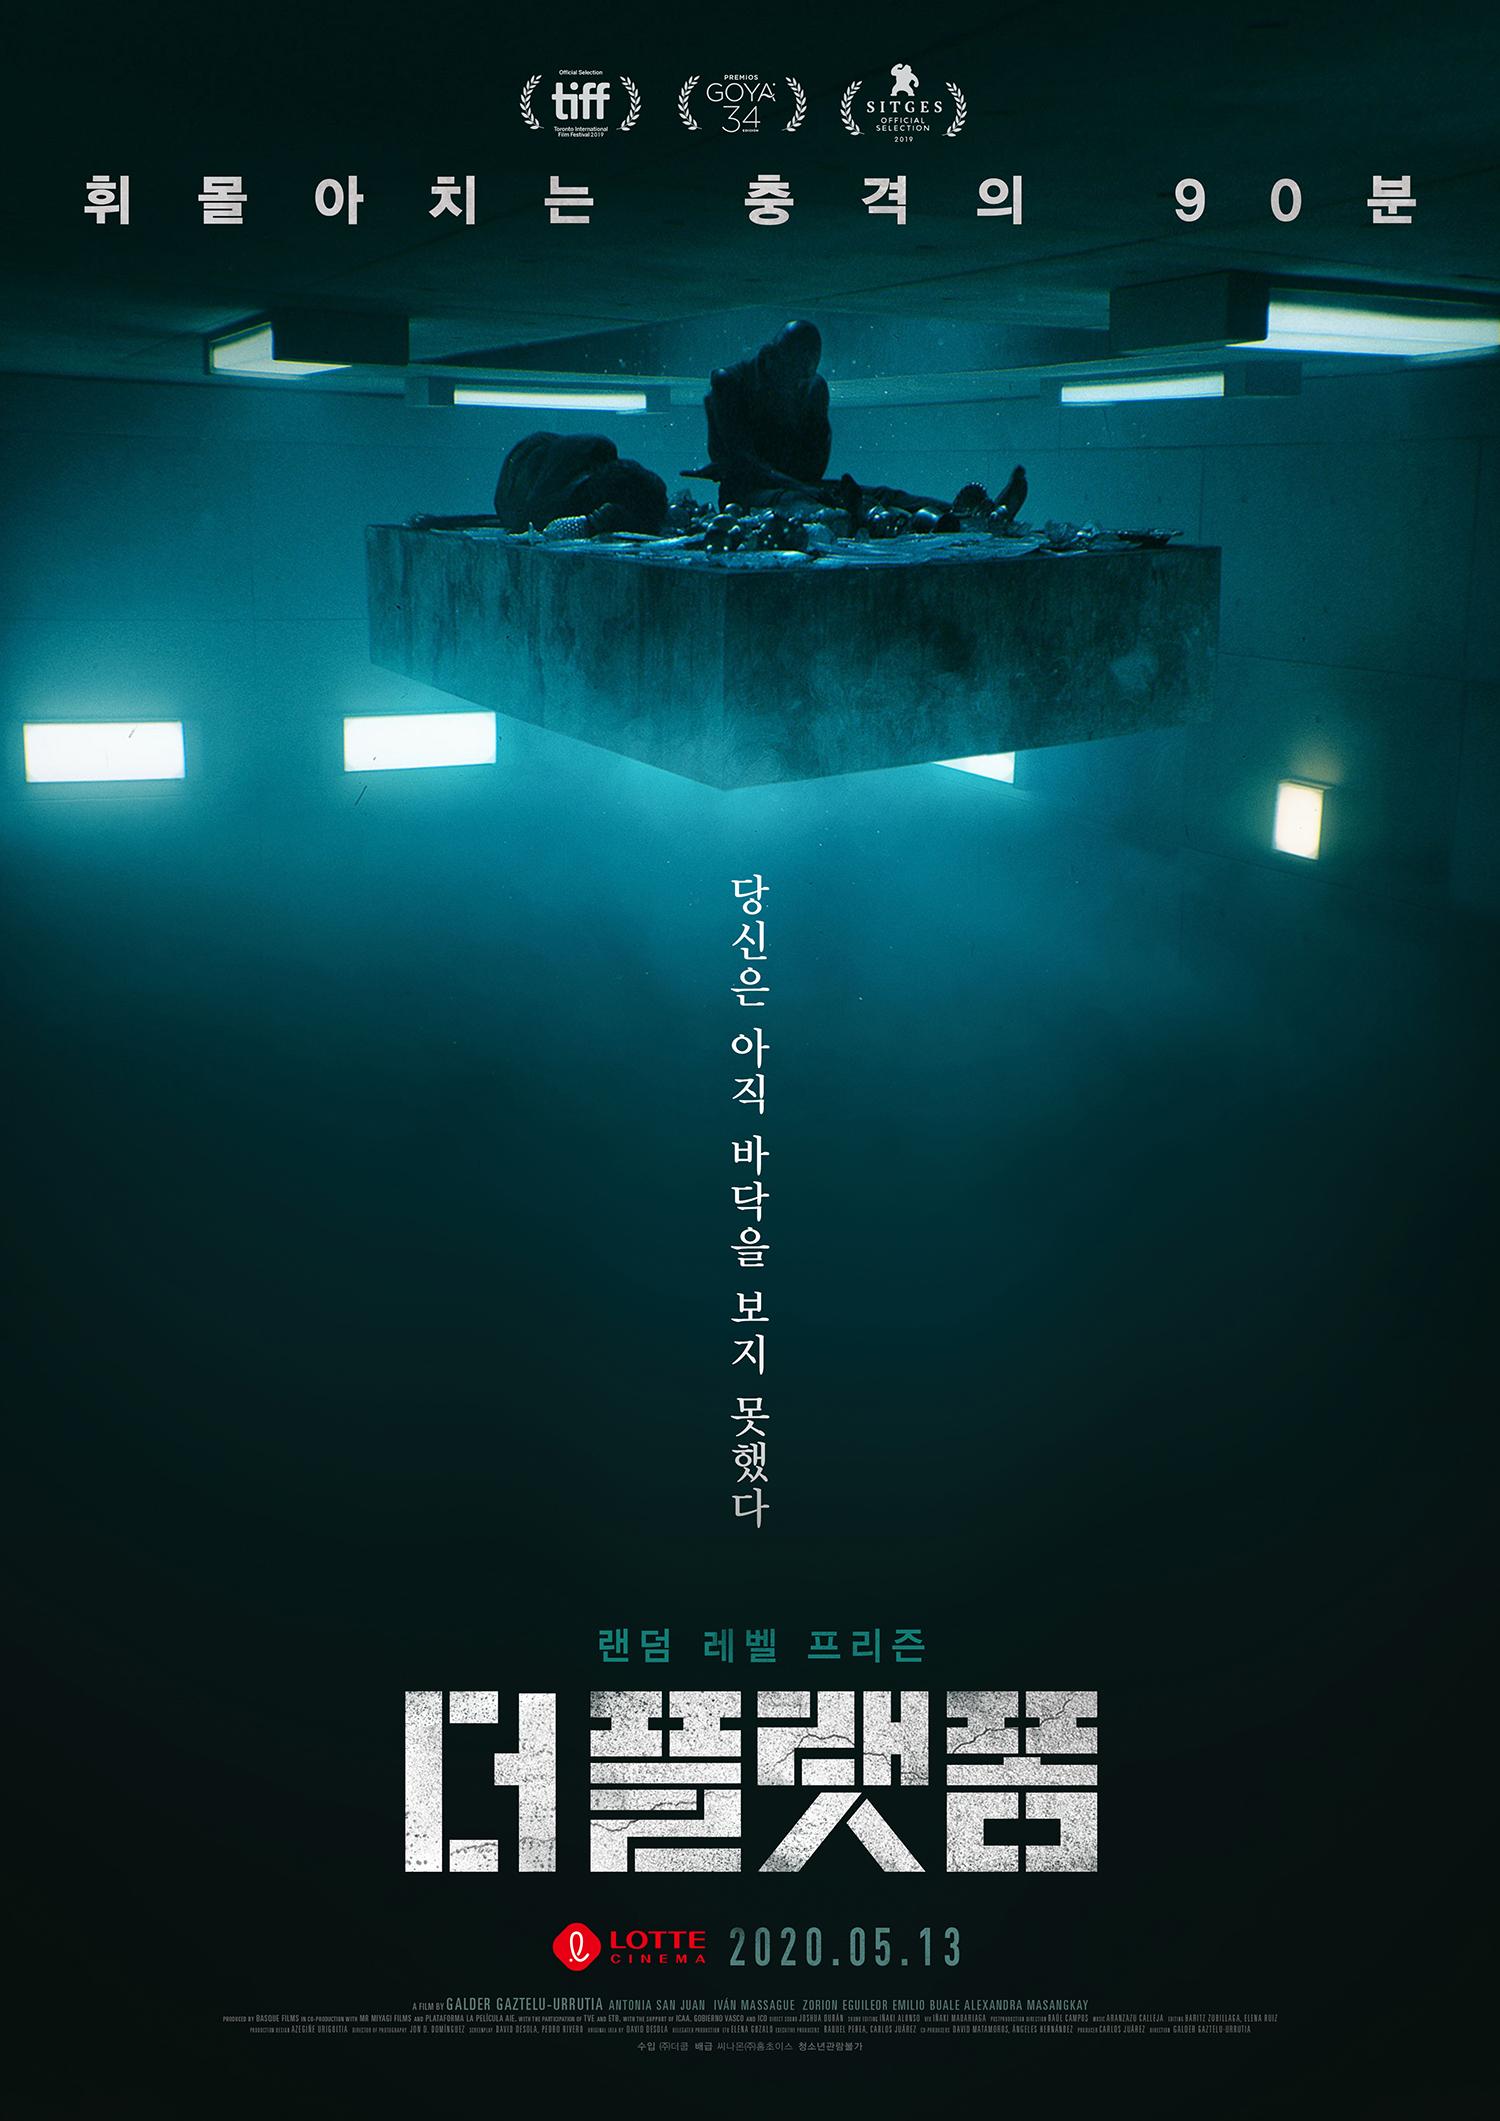 https://movie-phinf.pstatic.net/20200506_168/1588731103437Jz8kl_JPEG/movie_image.jpg